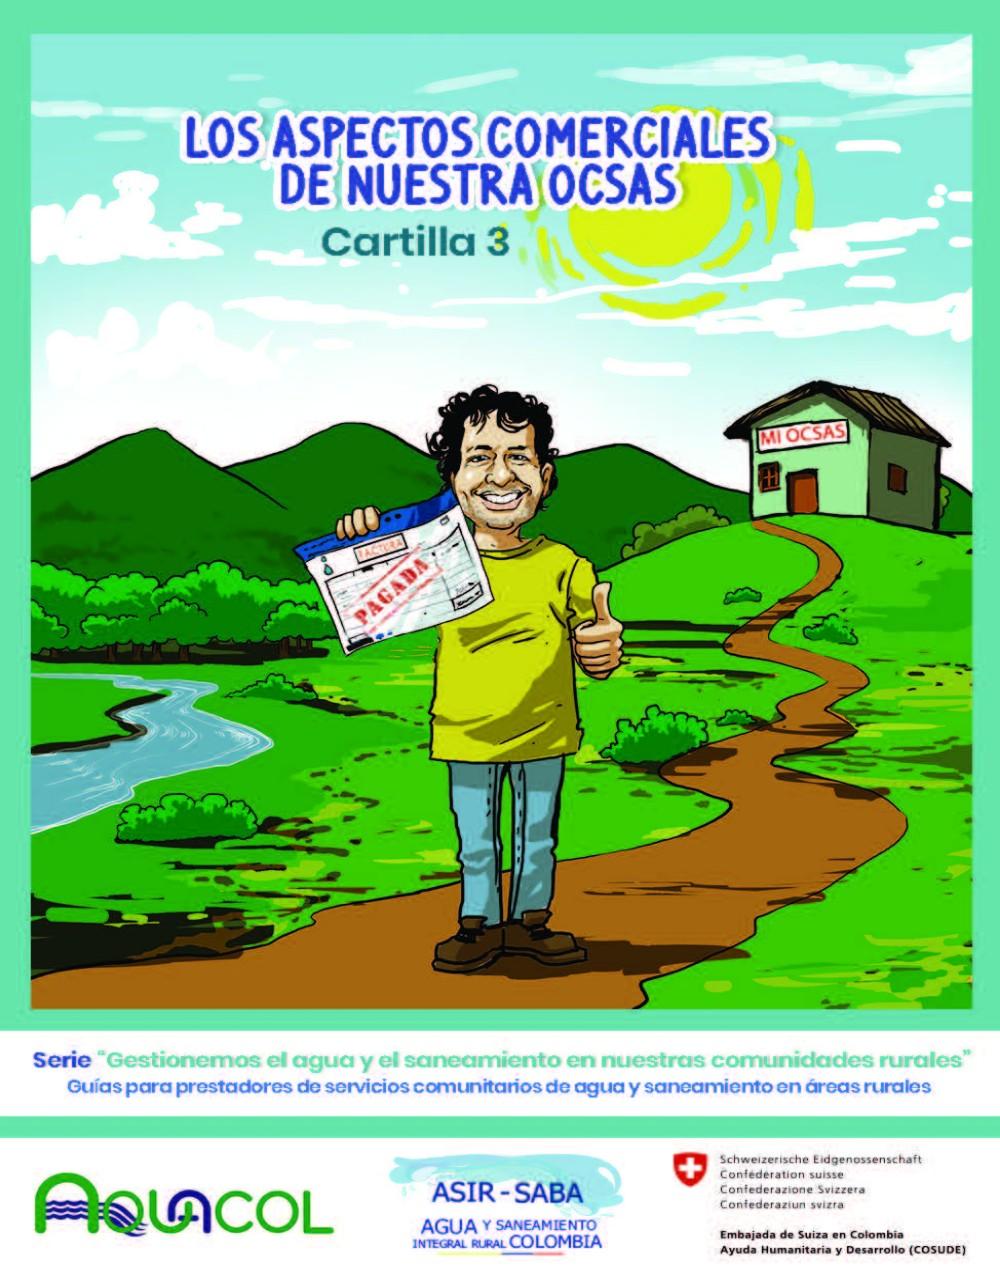 Cartilla 3_Aspectos Comerciales_Tarifas_Desactualizado_Ver revista CR1_Página_01 (1)